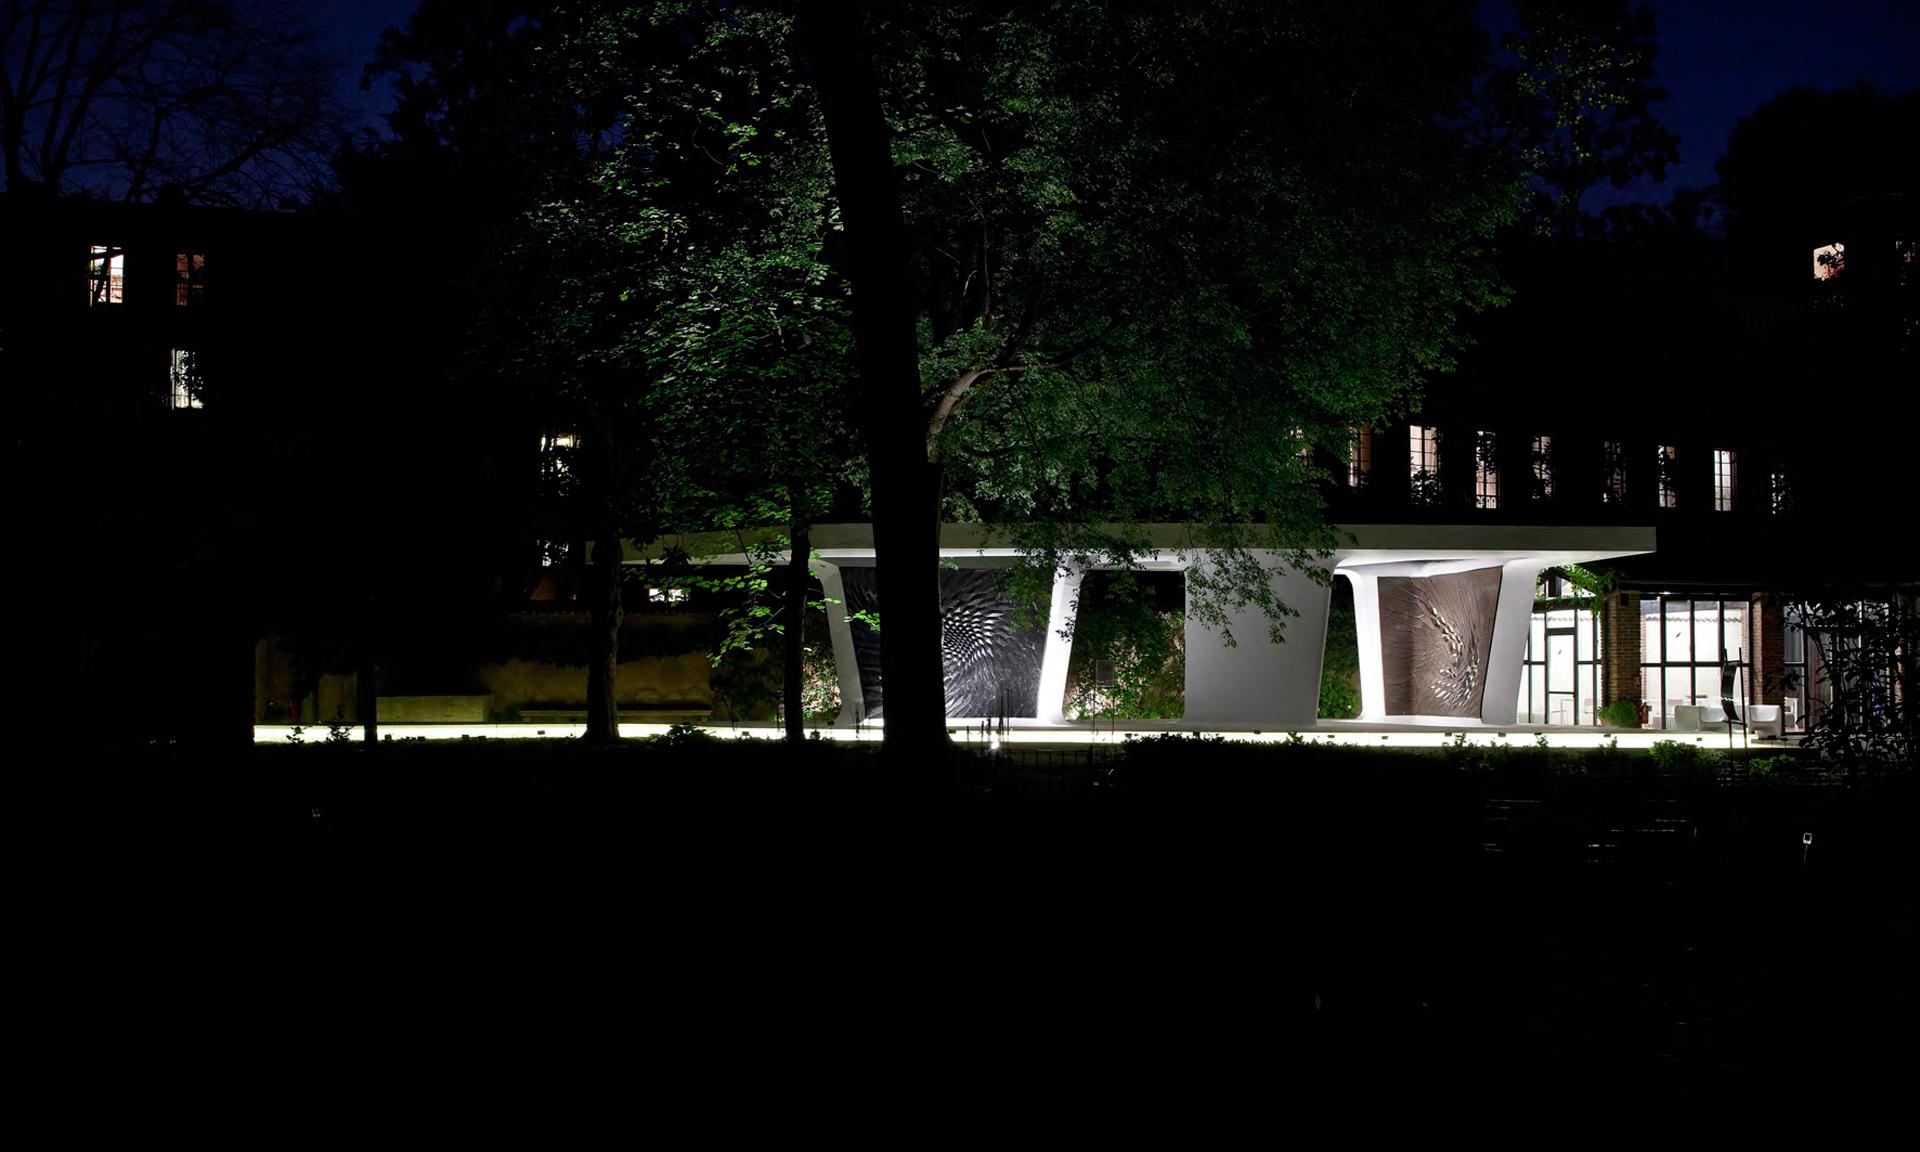 PJC-Light-Studio-Citco-Pavilion-Milan-01W.jpg